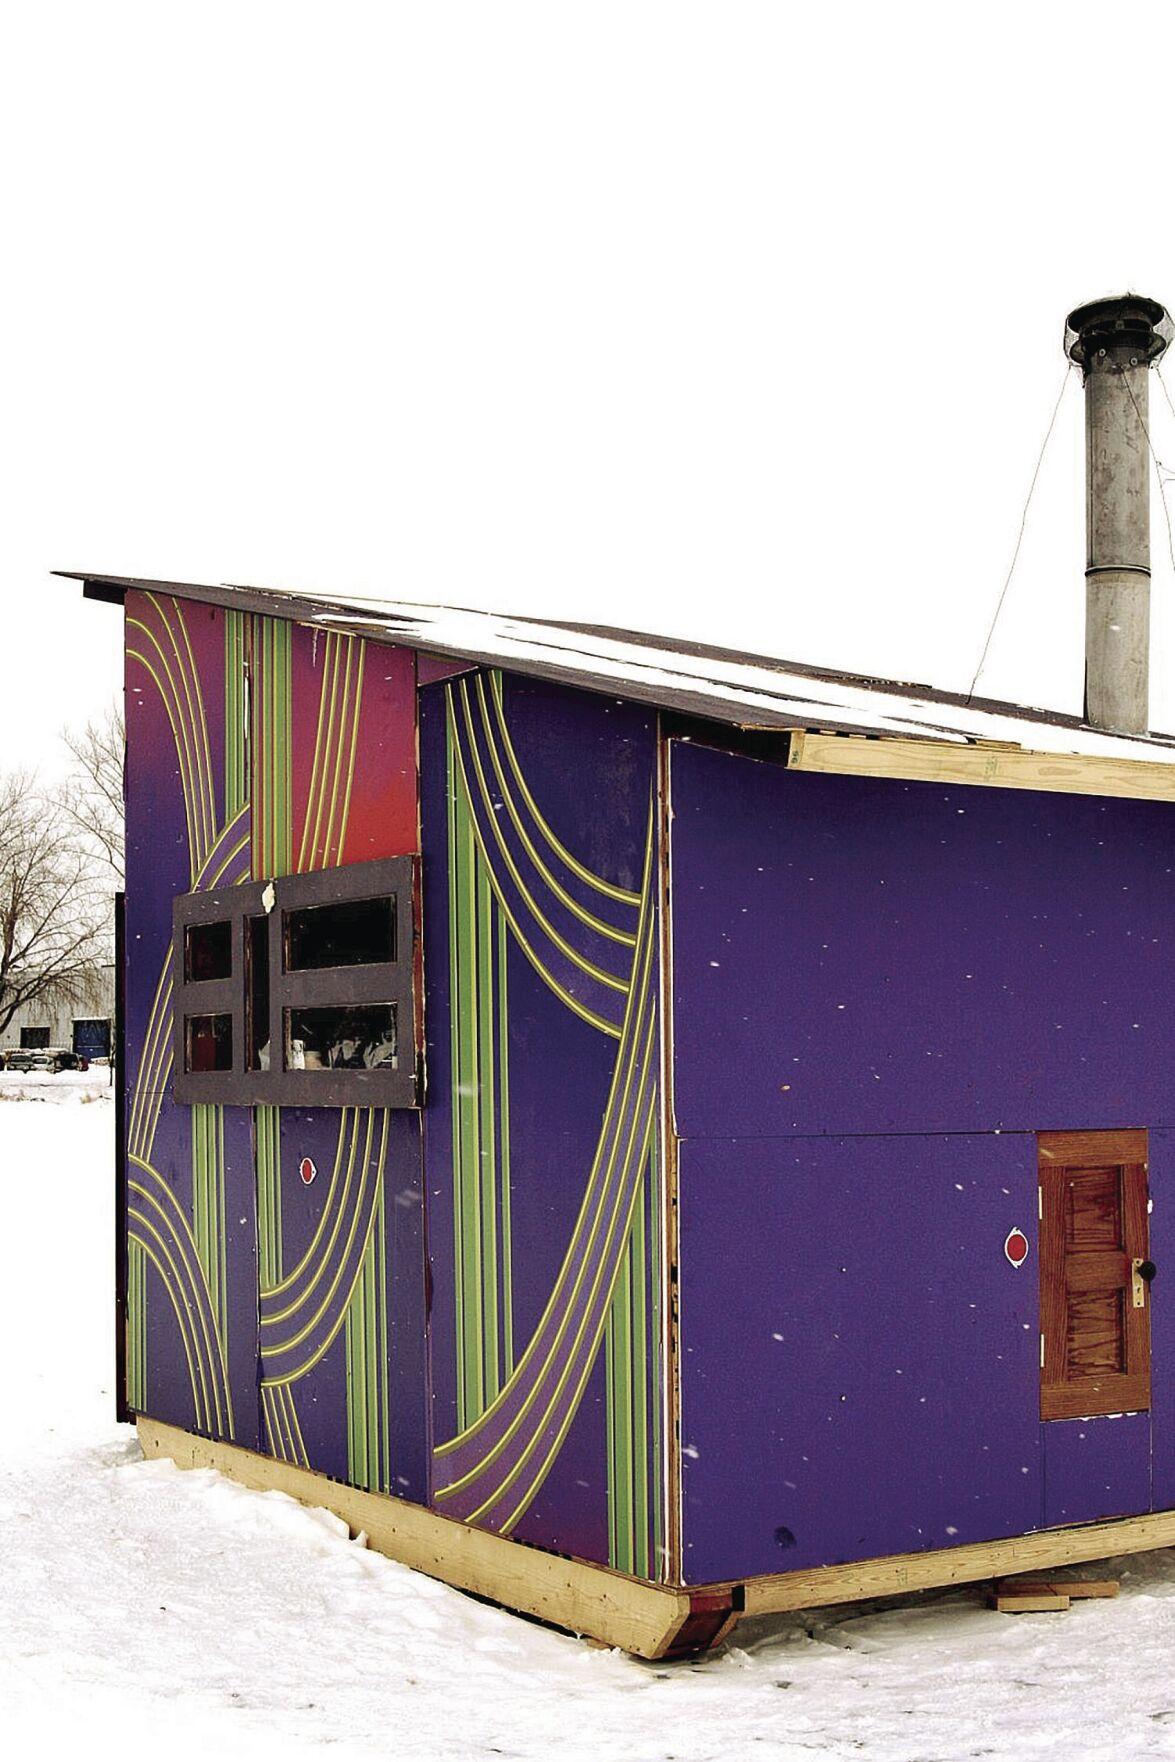 Purple-ice-shanty-by-Sharyn-Morrow_Flickr-CC-BY-NC-ND_RESIZE-T5.jpg